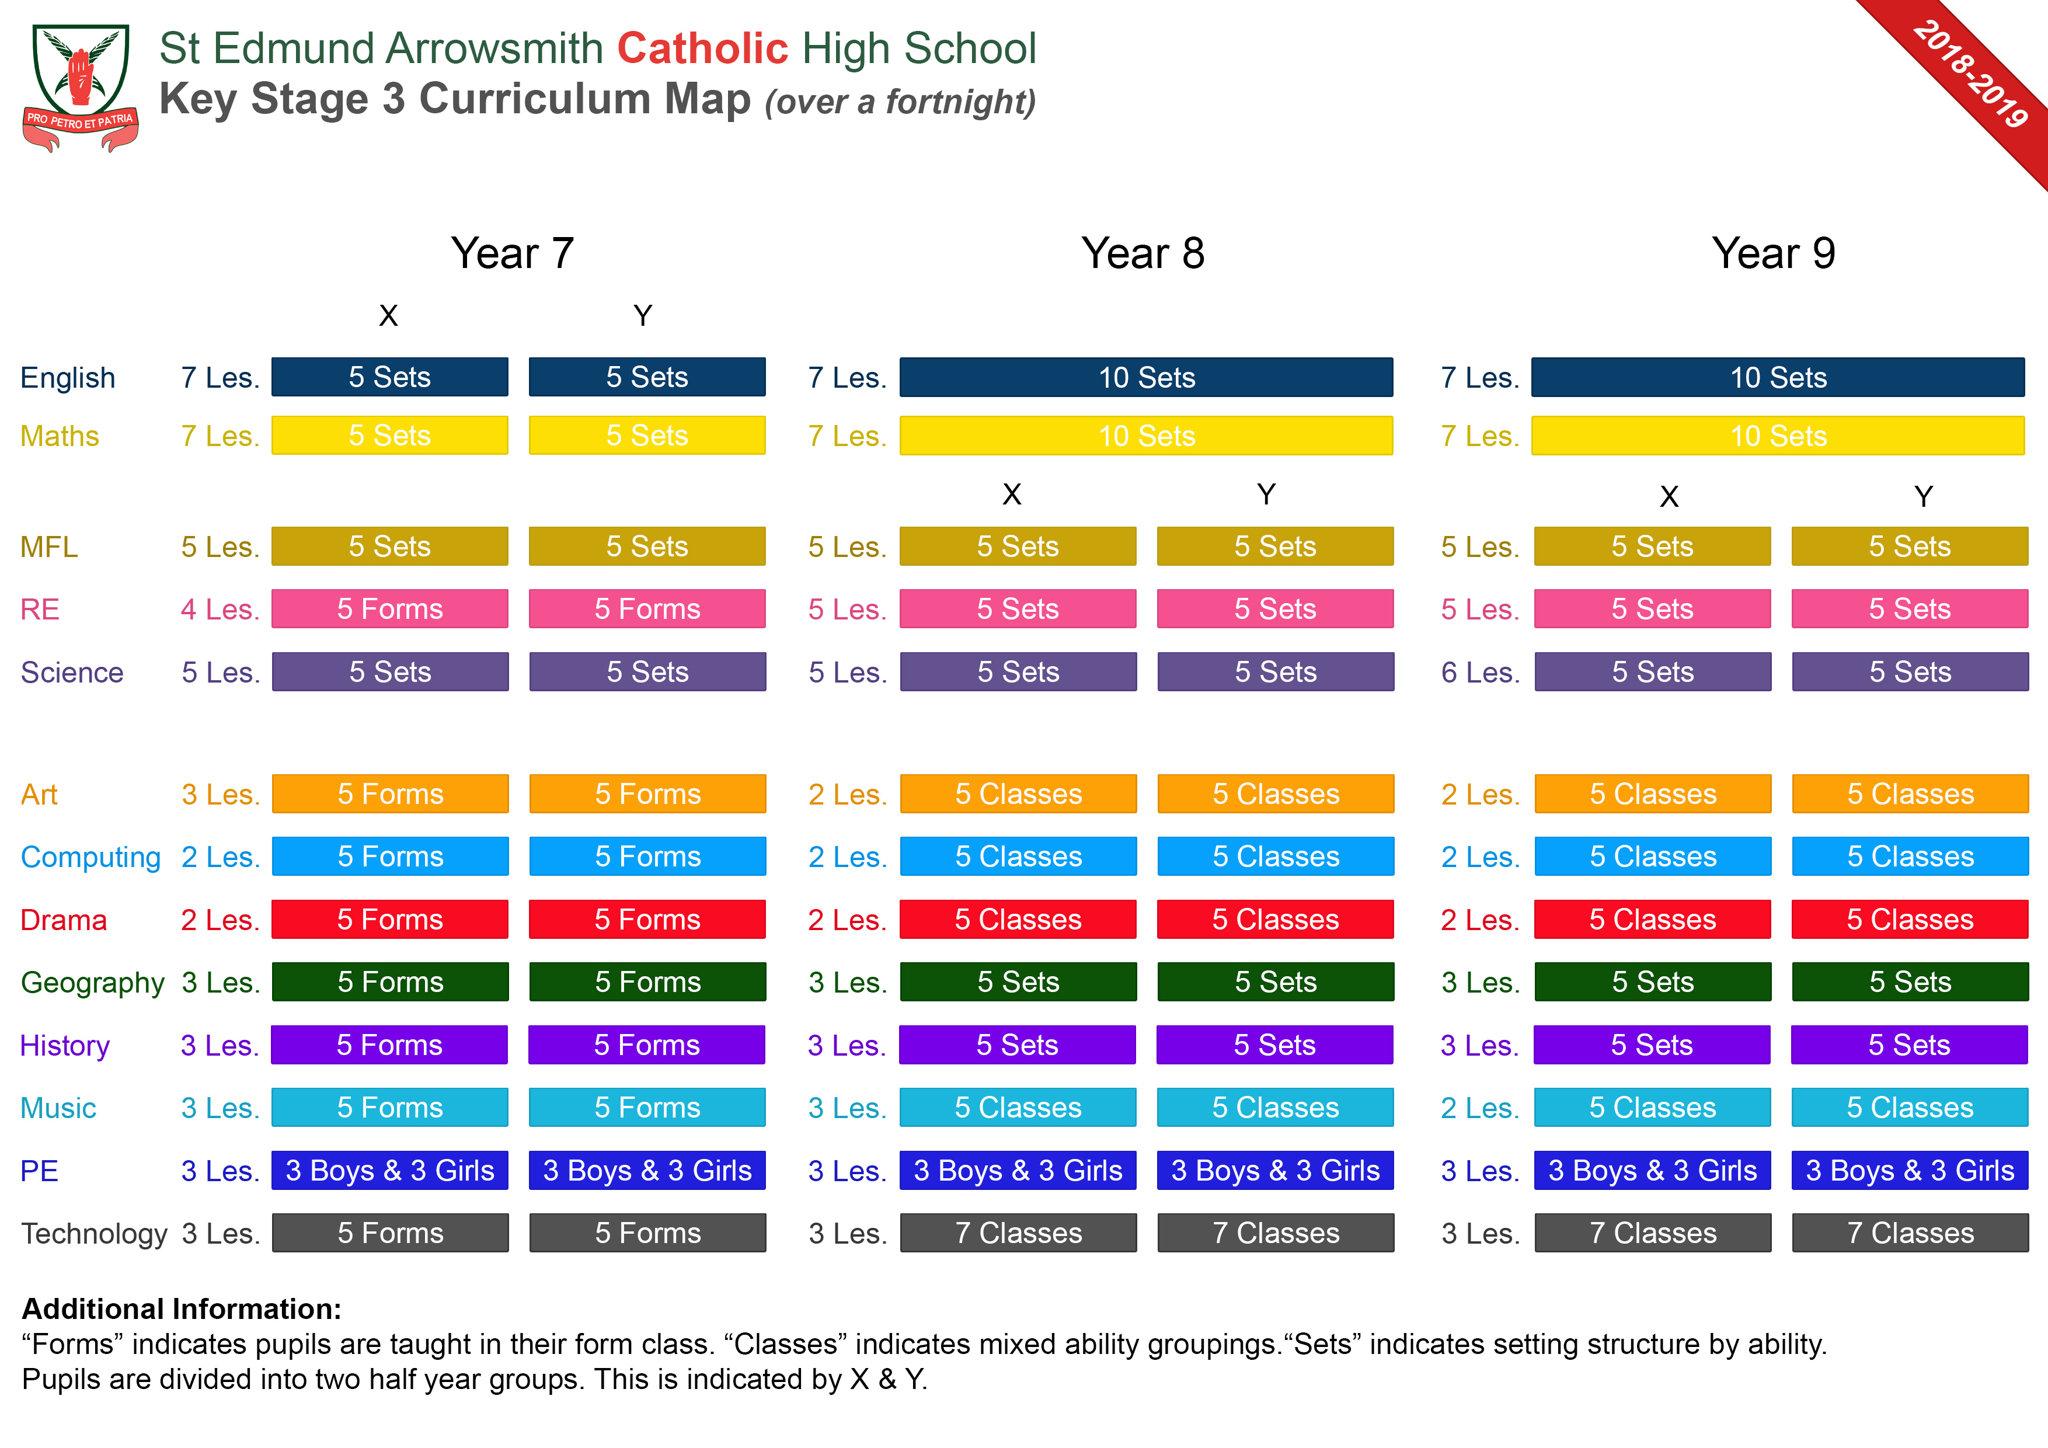 Map Of Uk Key Stage 1.Key Stage 3 Curriculum Map St Edmund Arrowsmith Catholic High School